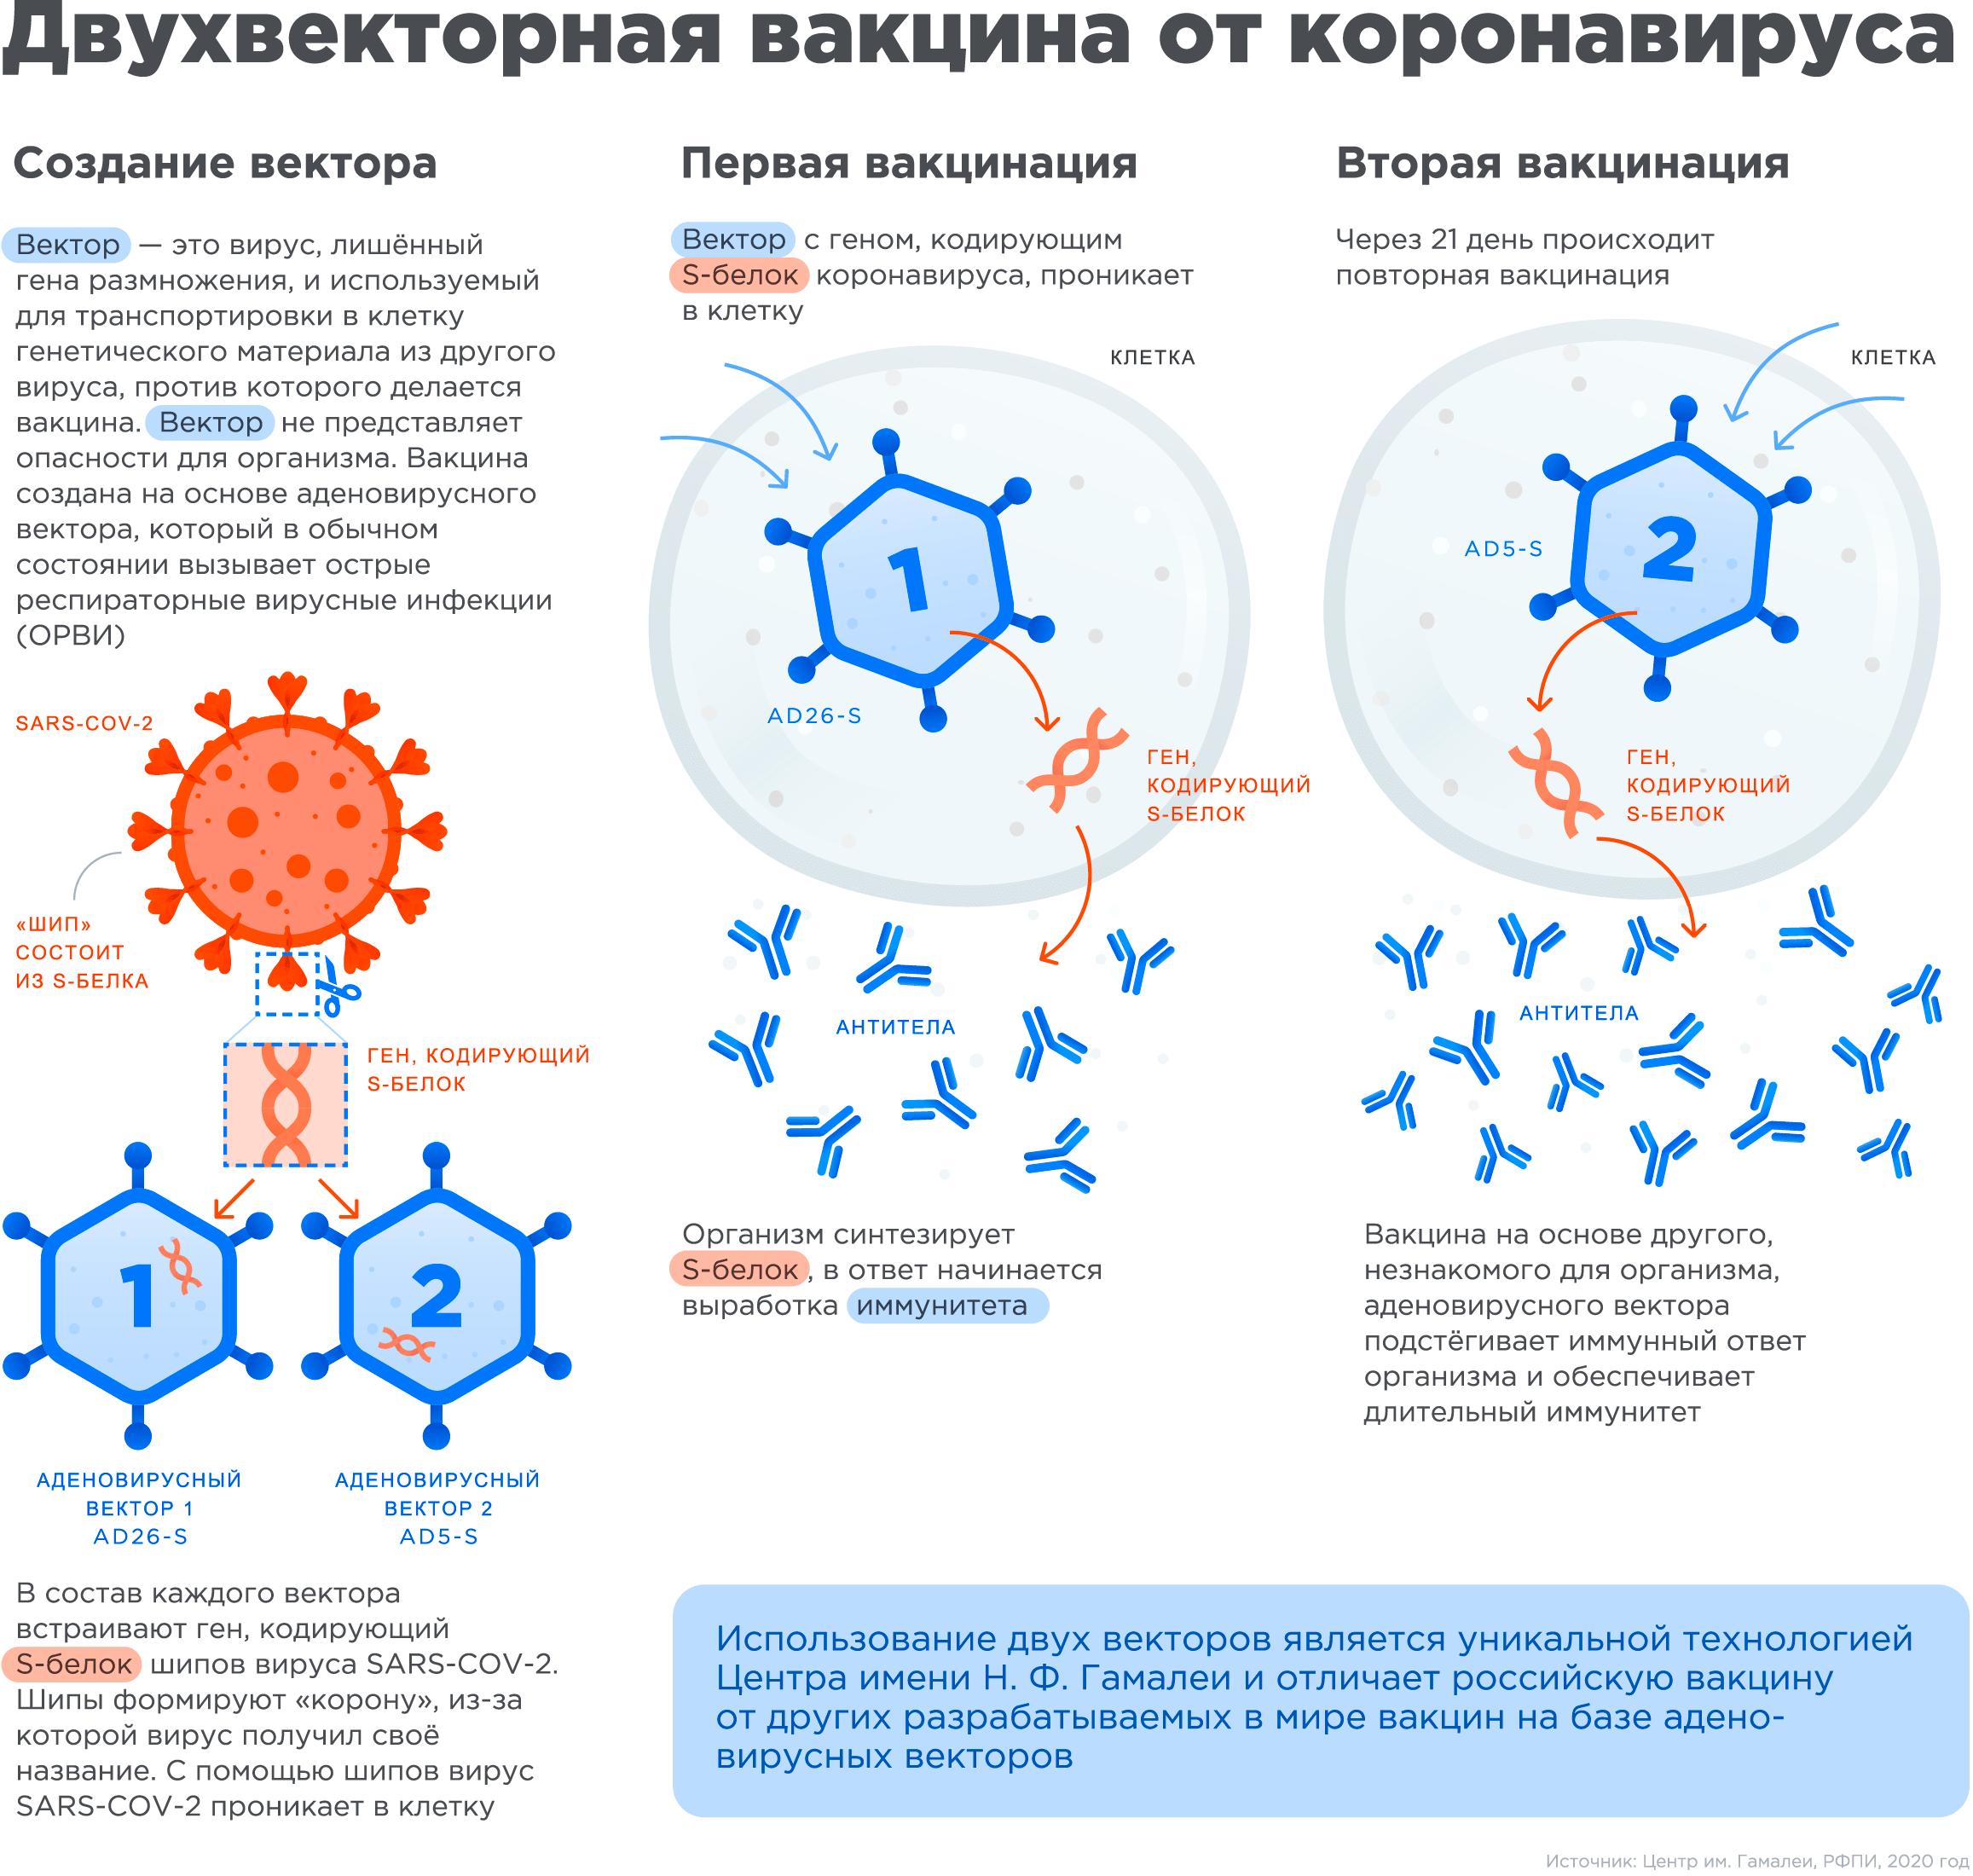 Источник: https://www.gamaleya.org/research/vaktsina-protiv-covid-19/